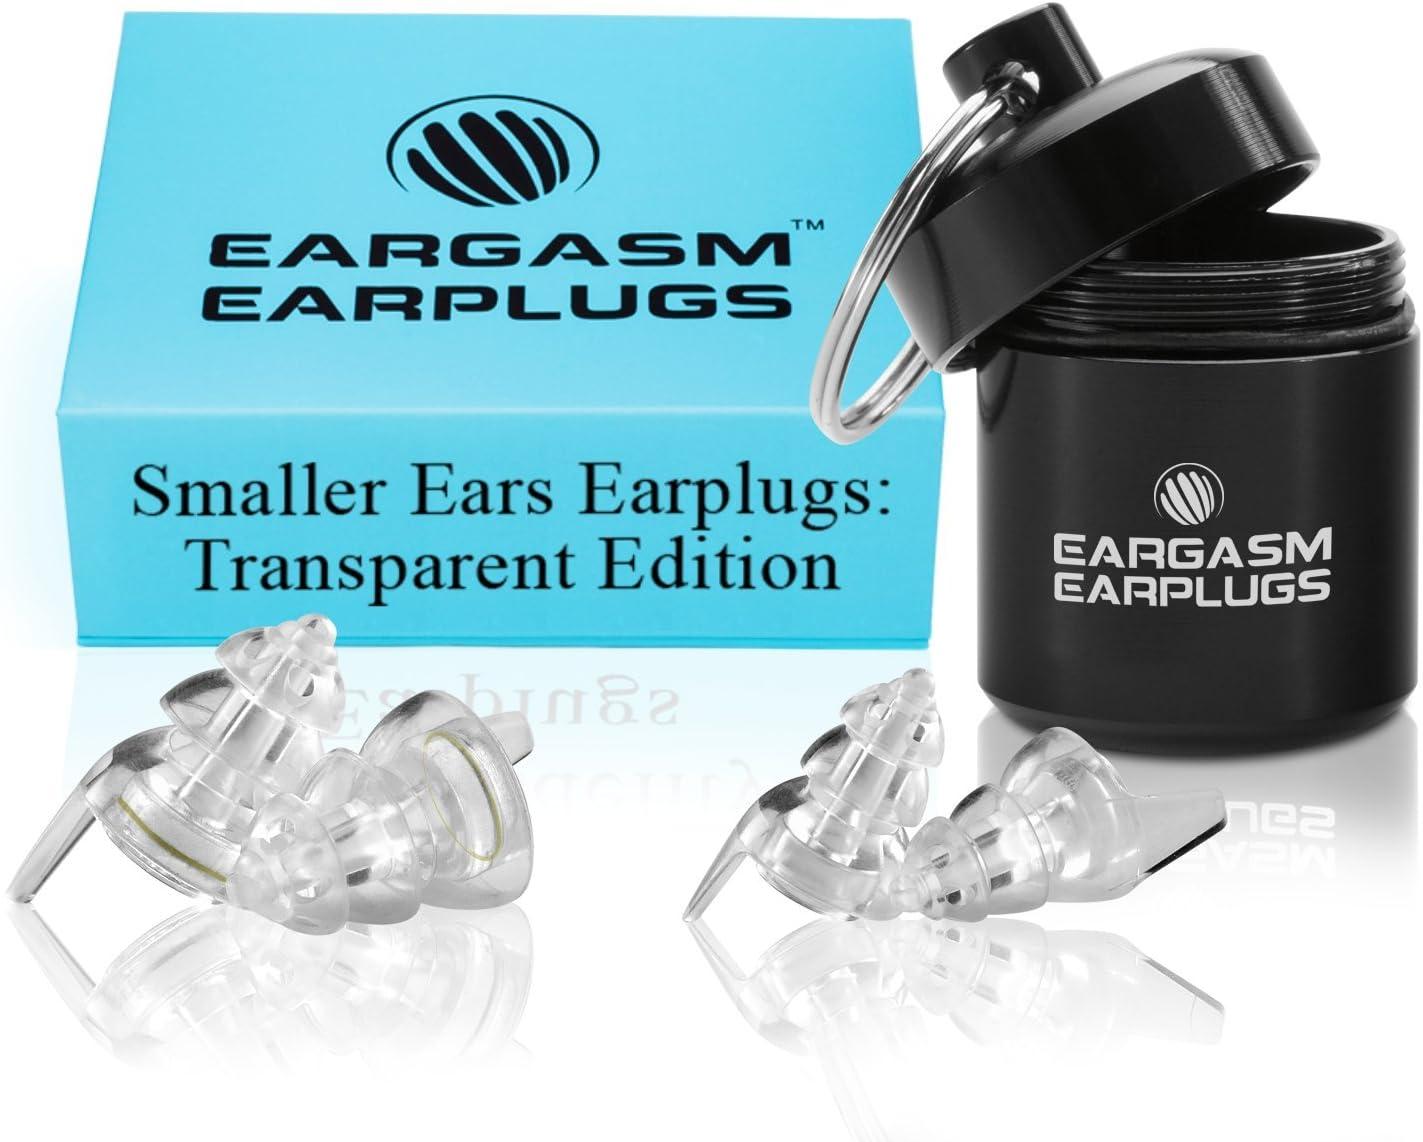 Eargasm Smaller Ears Earplugs: Transparent Edition